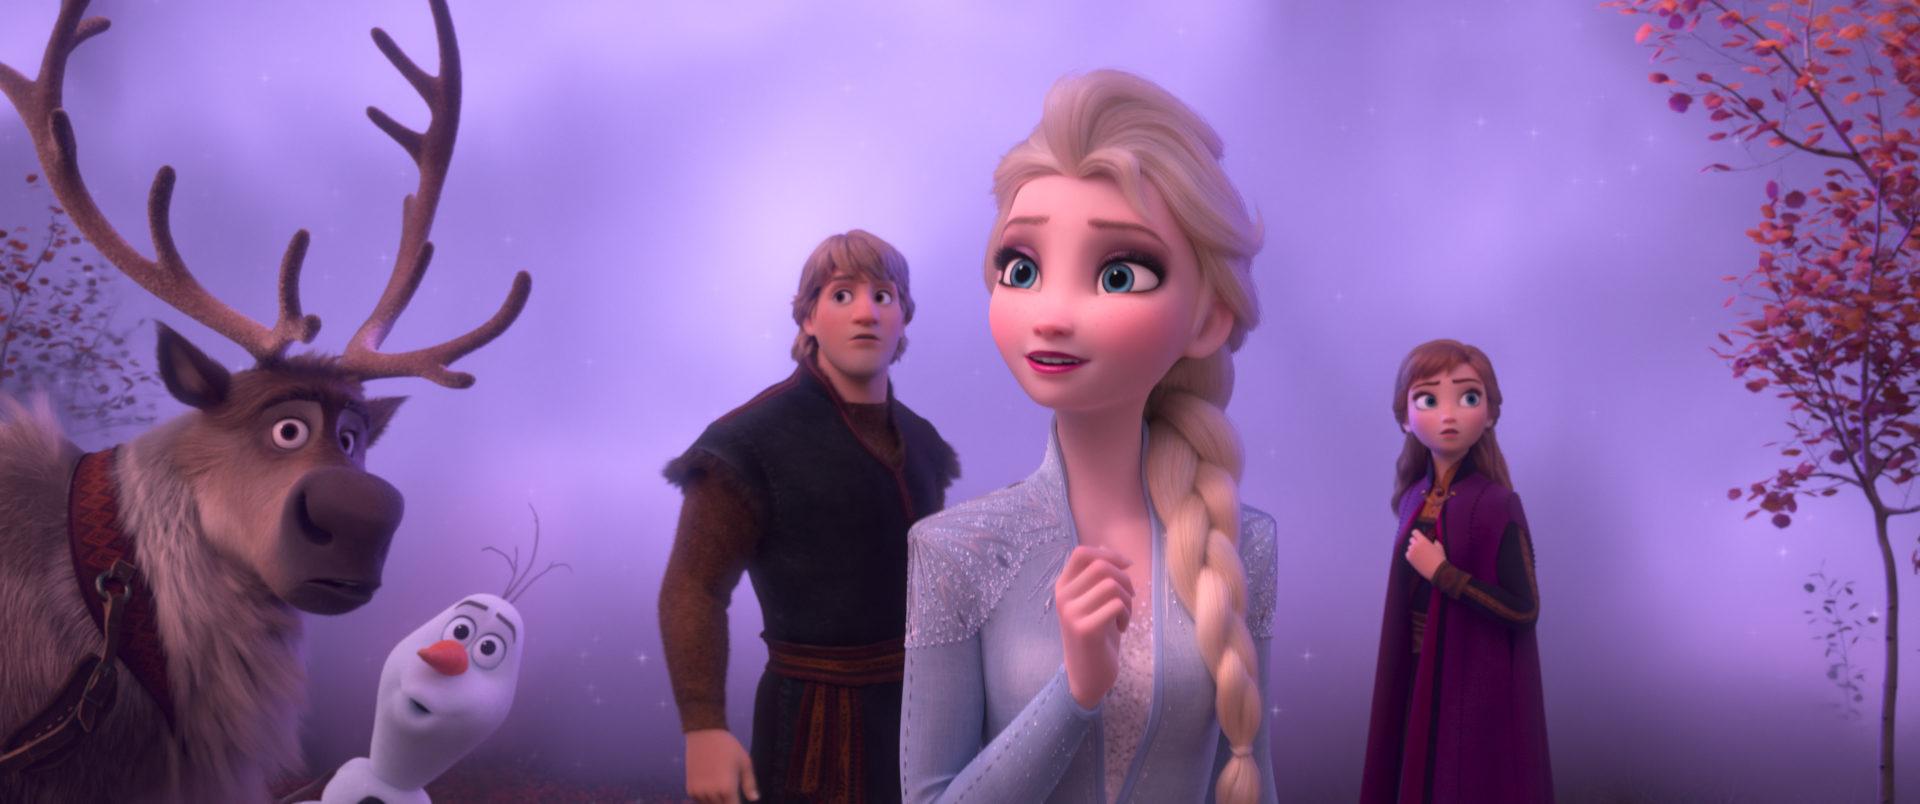 Frozen 2 (dub)